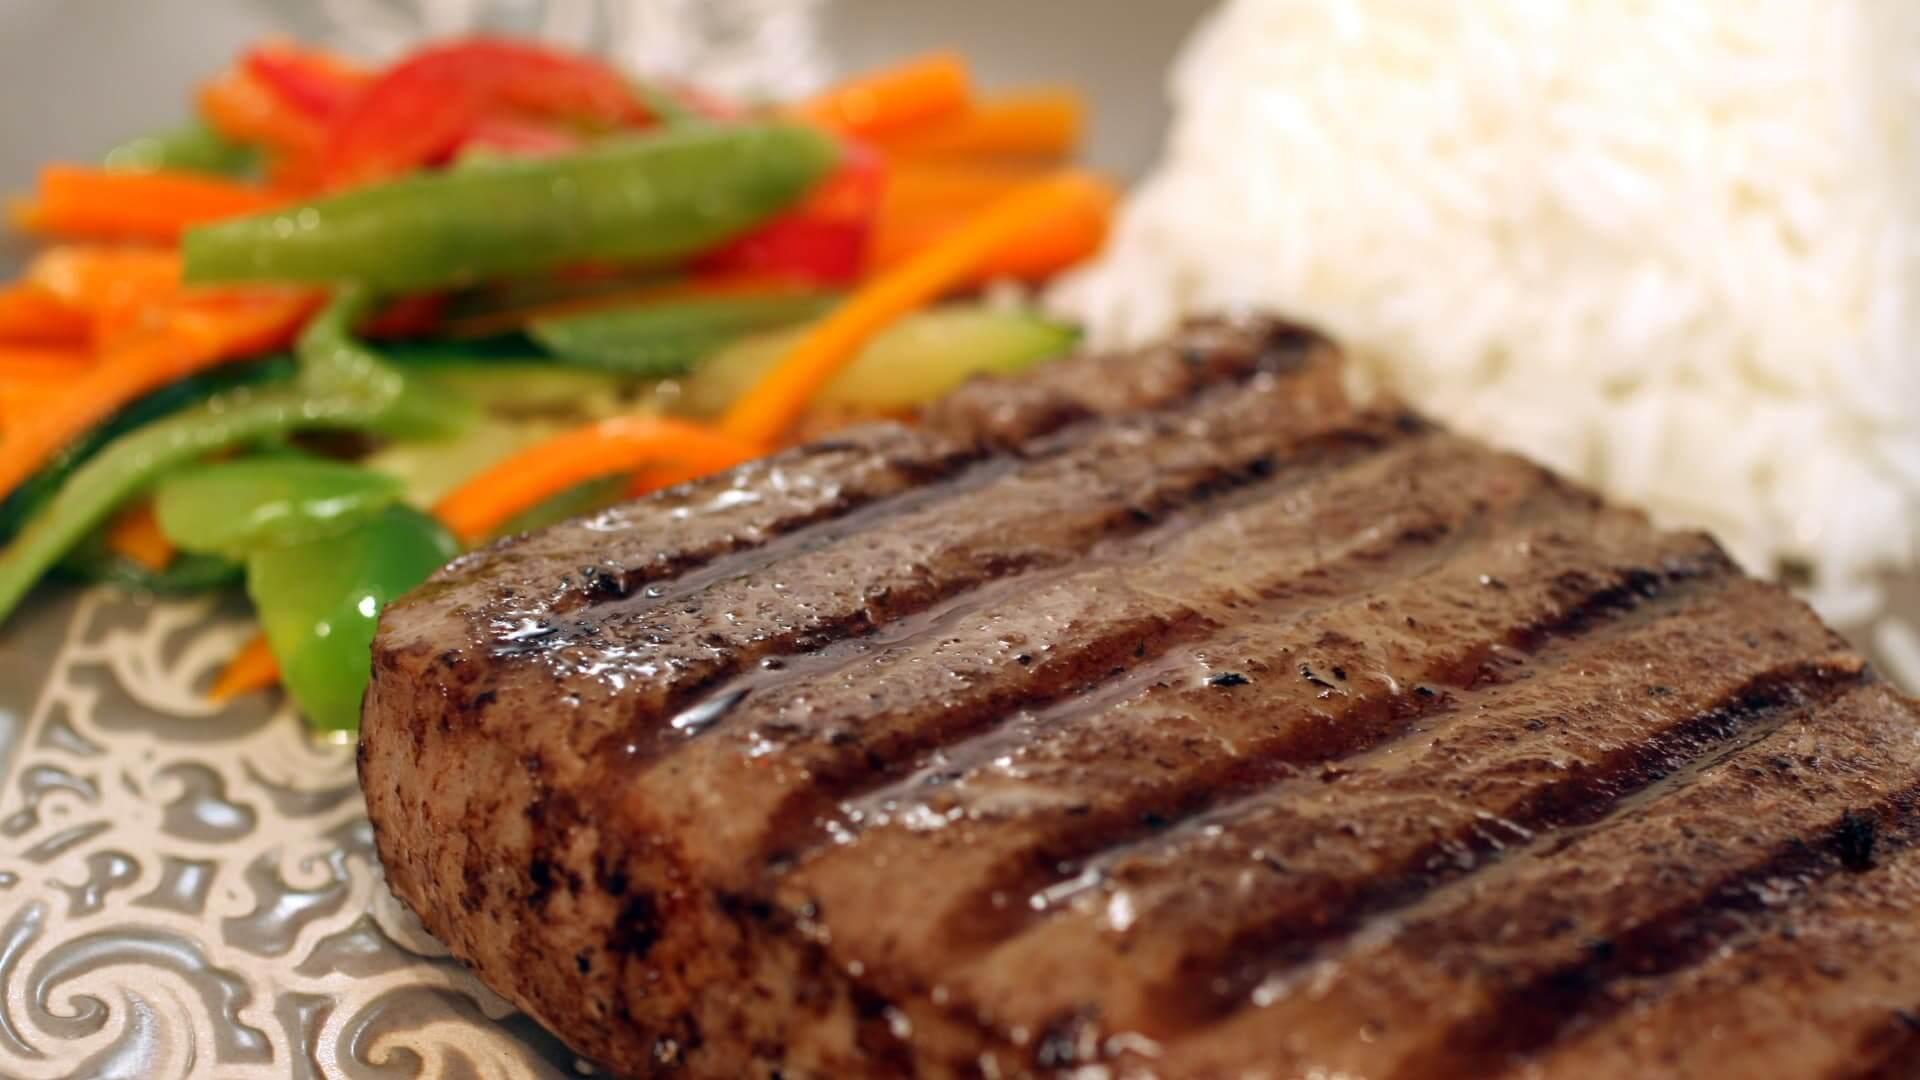 Best pan for steaks